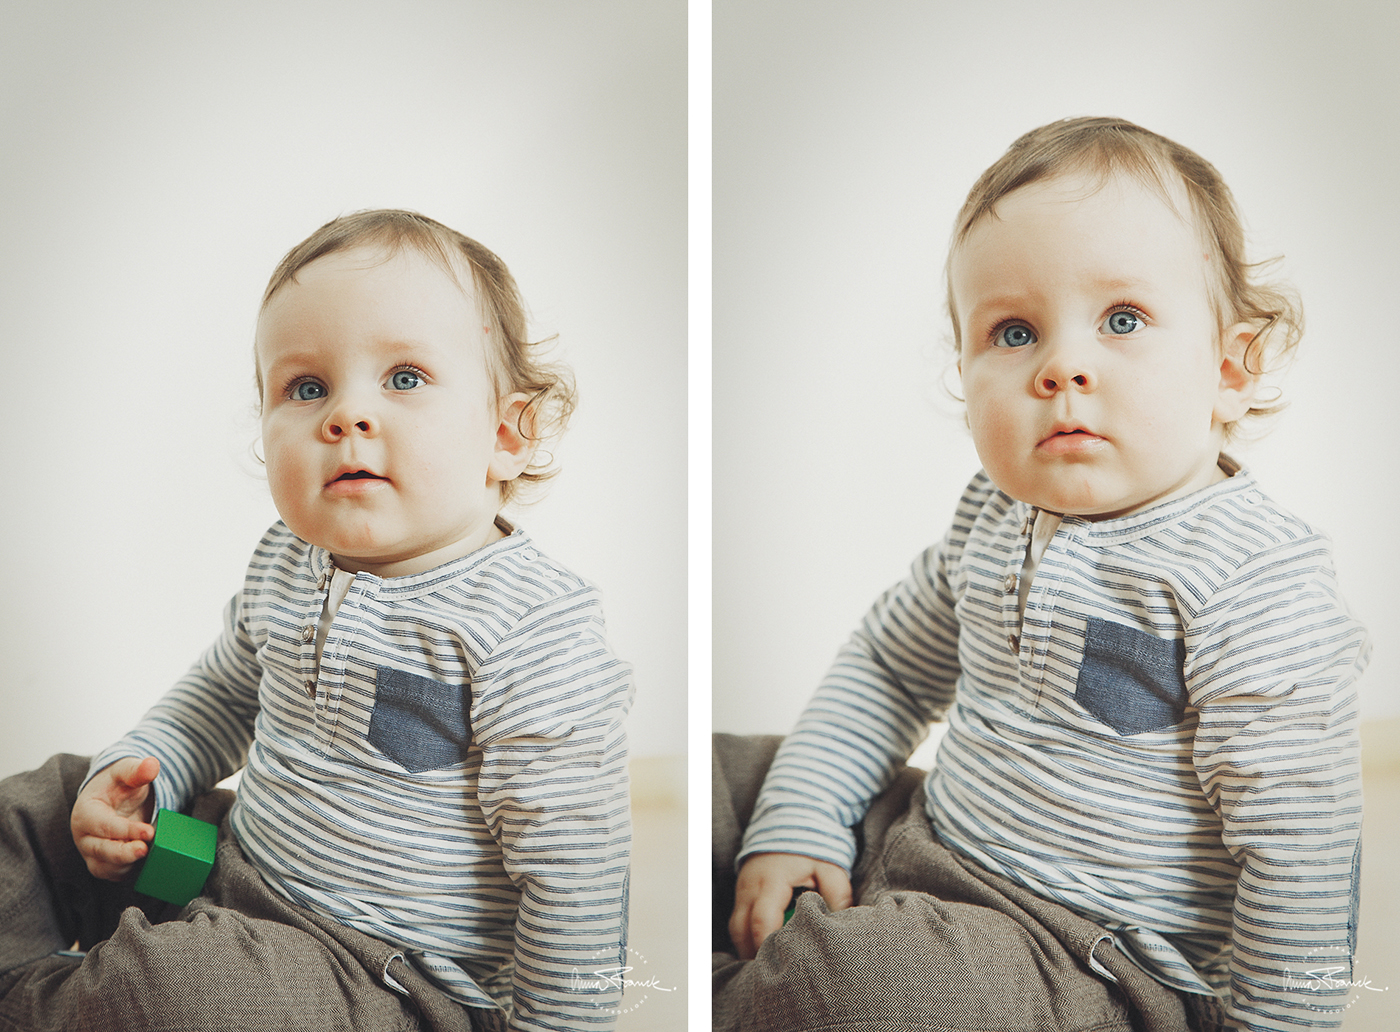 barnfotografering, lapsikuvaus, kids, portrait, photography, anna, franck, fotografering, turku, åbo, finland, suomi, kotona, hemma, home, fotograf, stockholm